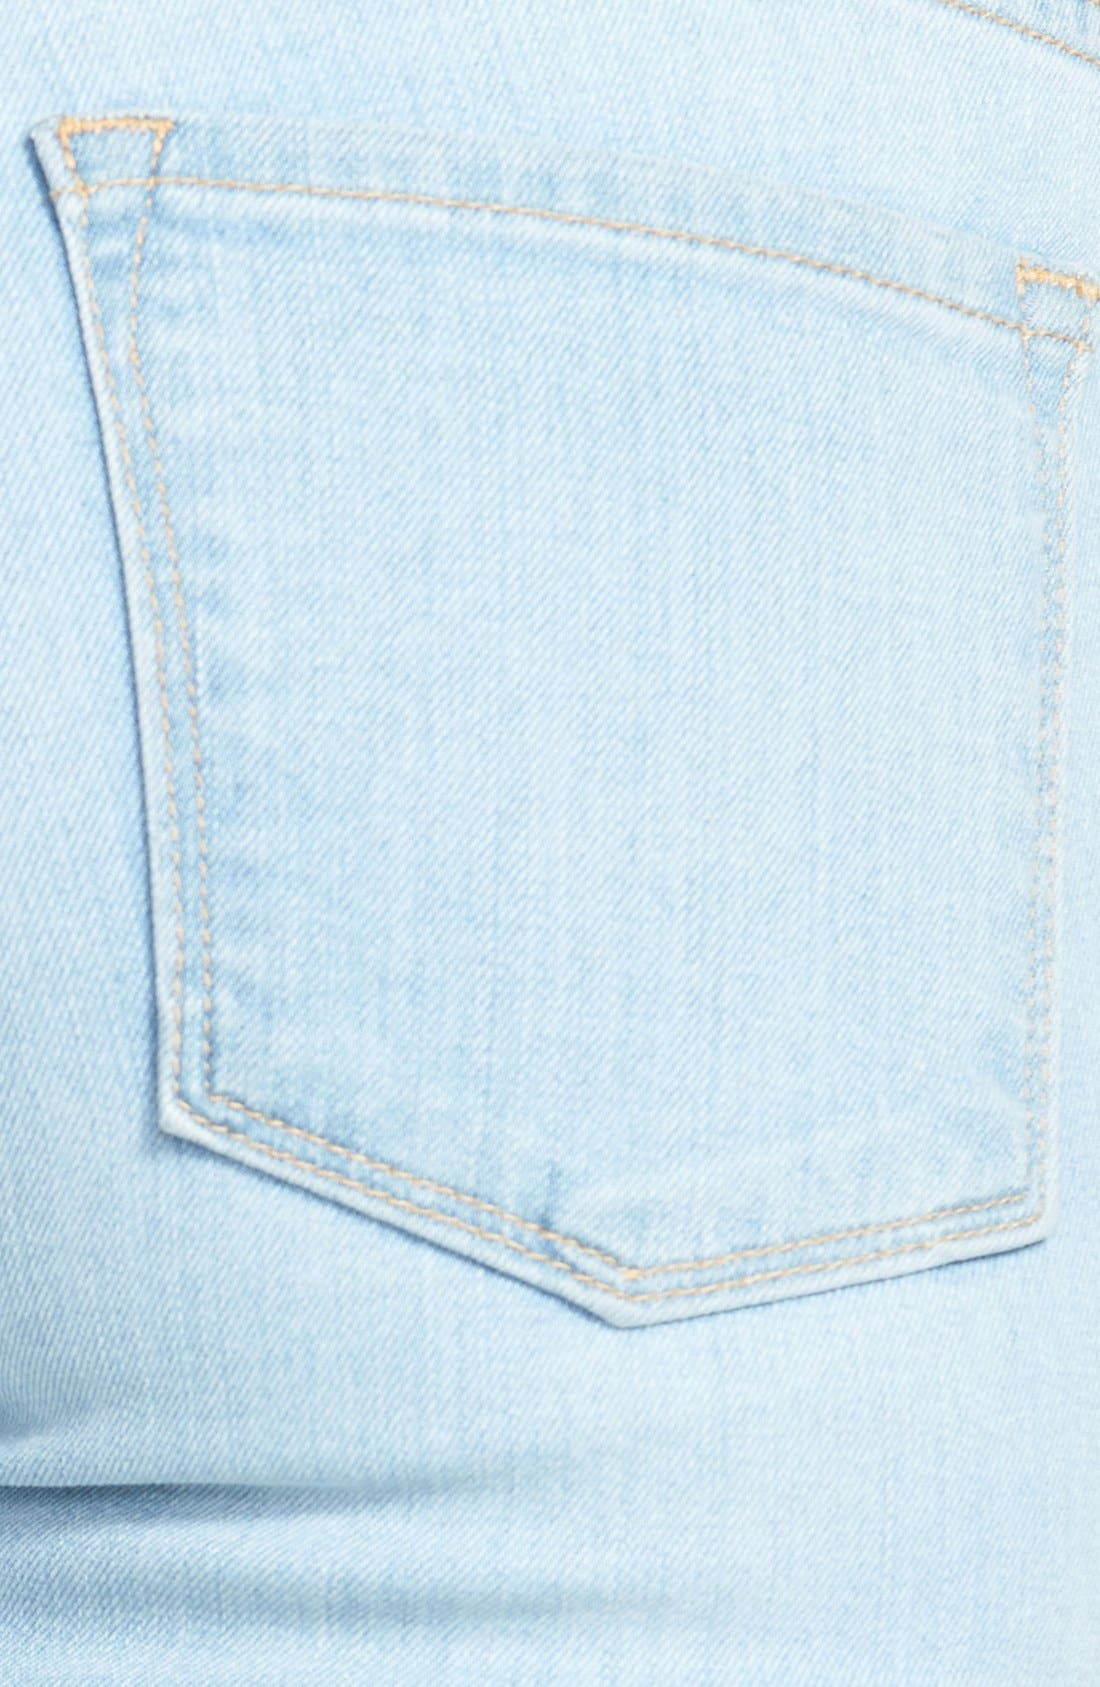 Alternate Image 4  - Frame Denim 'Le Skinny de Jeanne' Jeans (Redchurch Street)